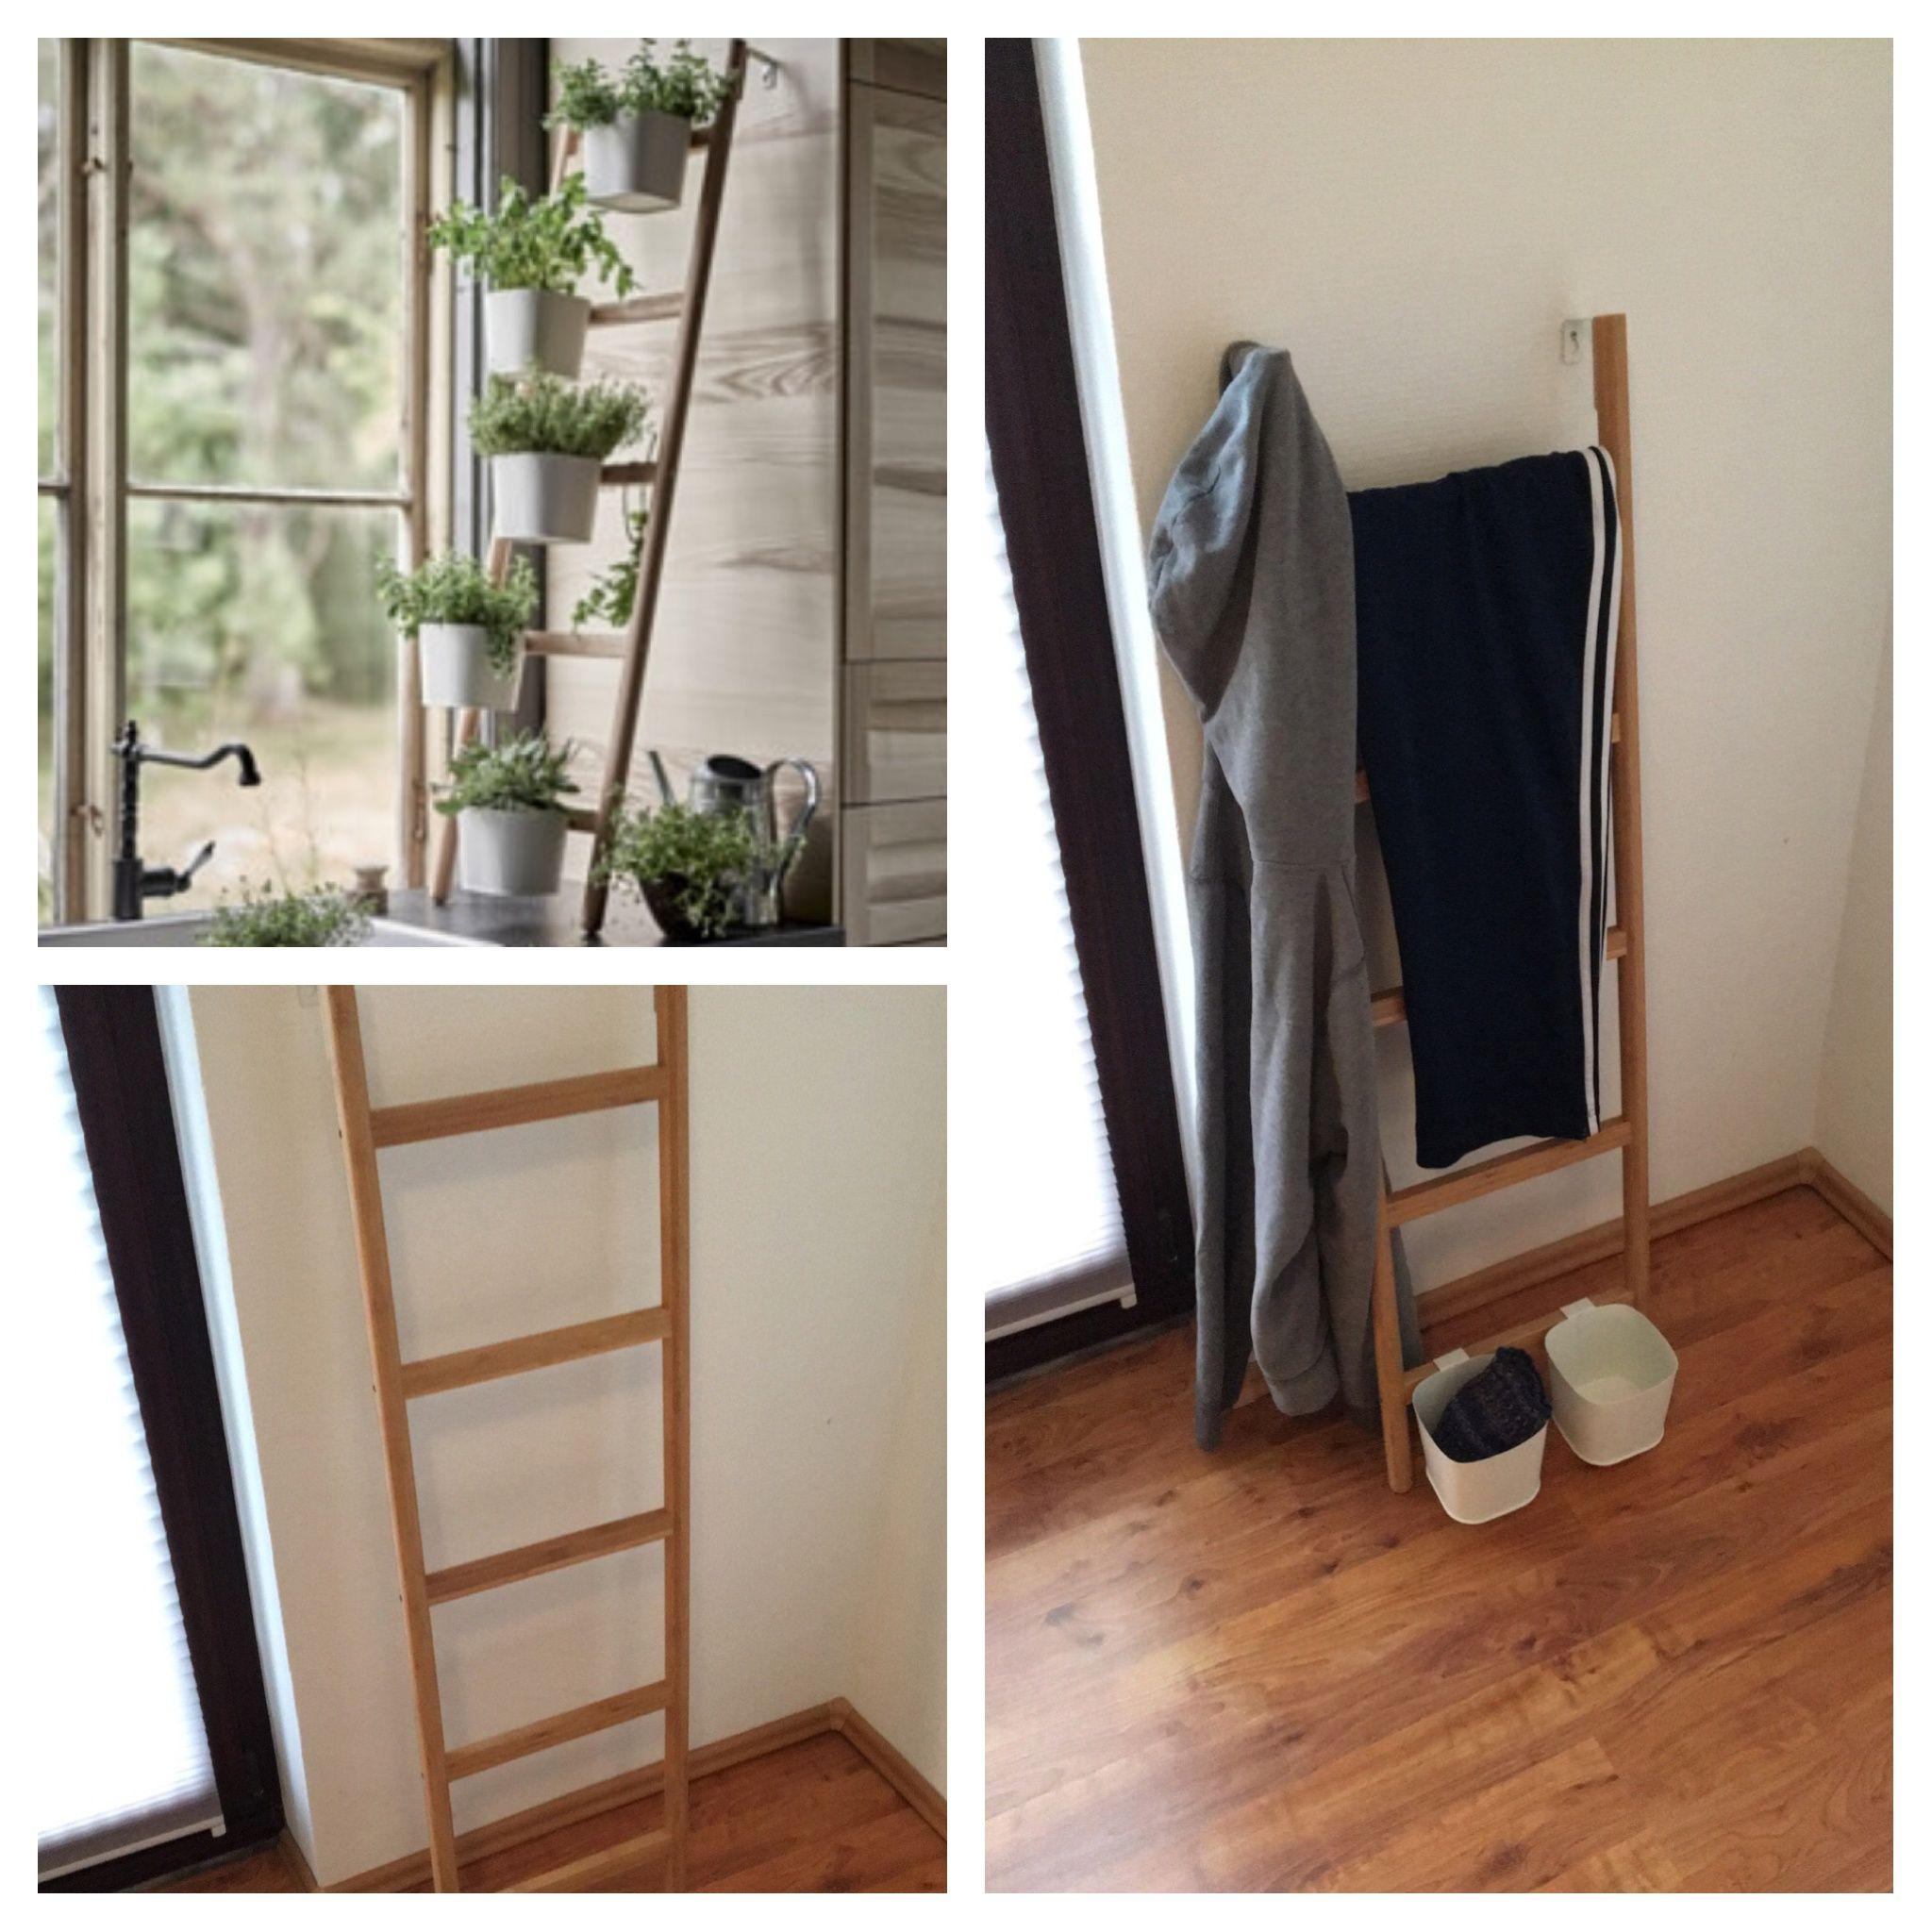 ikea satsumas hack clothing chair alternative wohnen wohnen. Black Bedroom Furniture Sets. Home Design Ideas